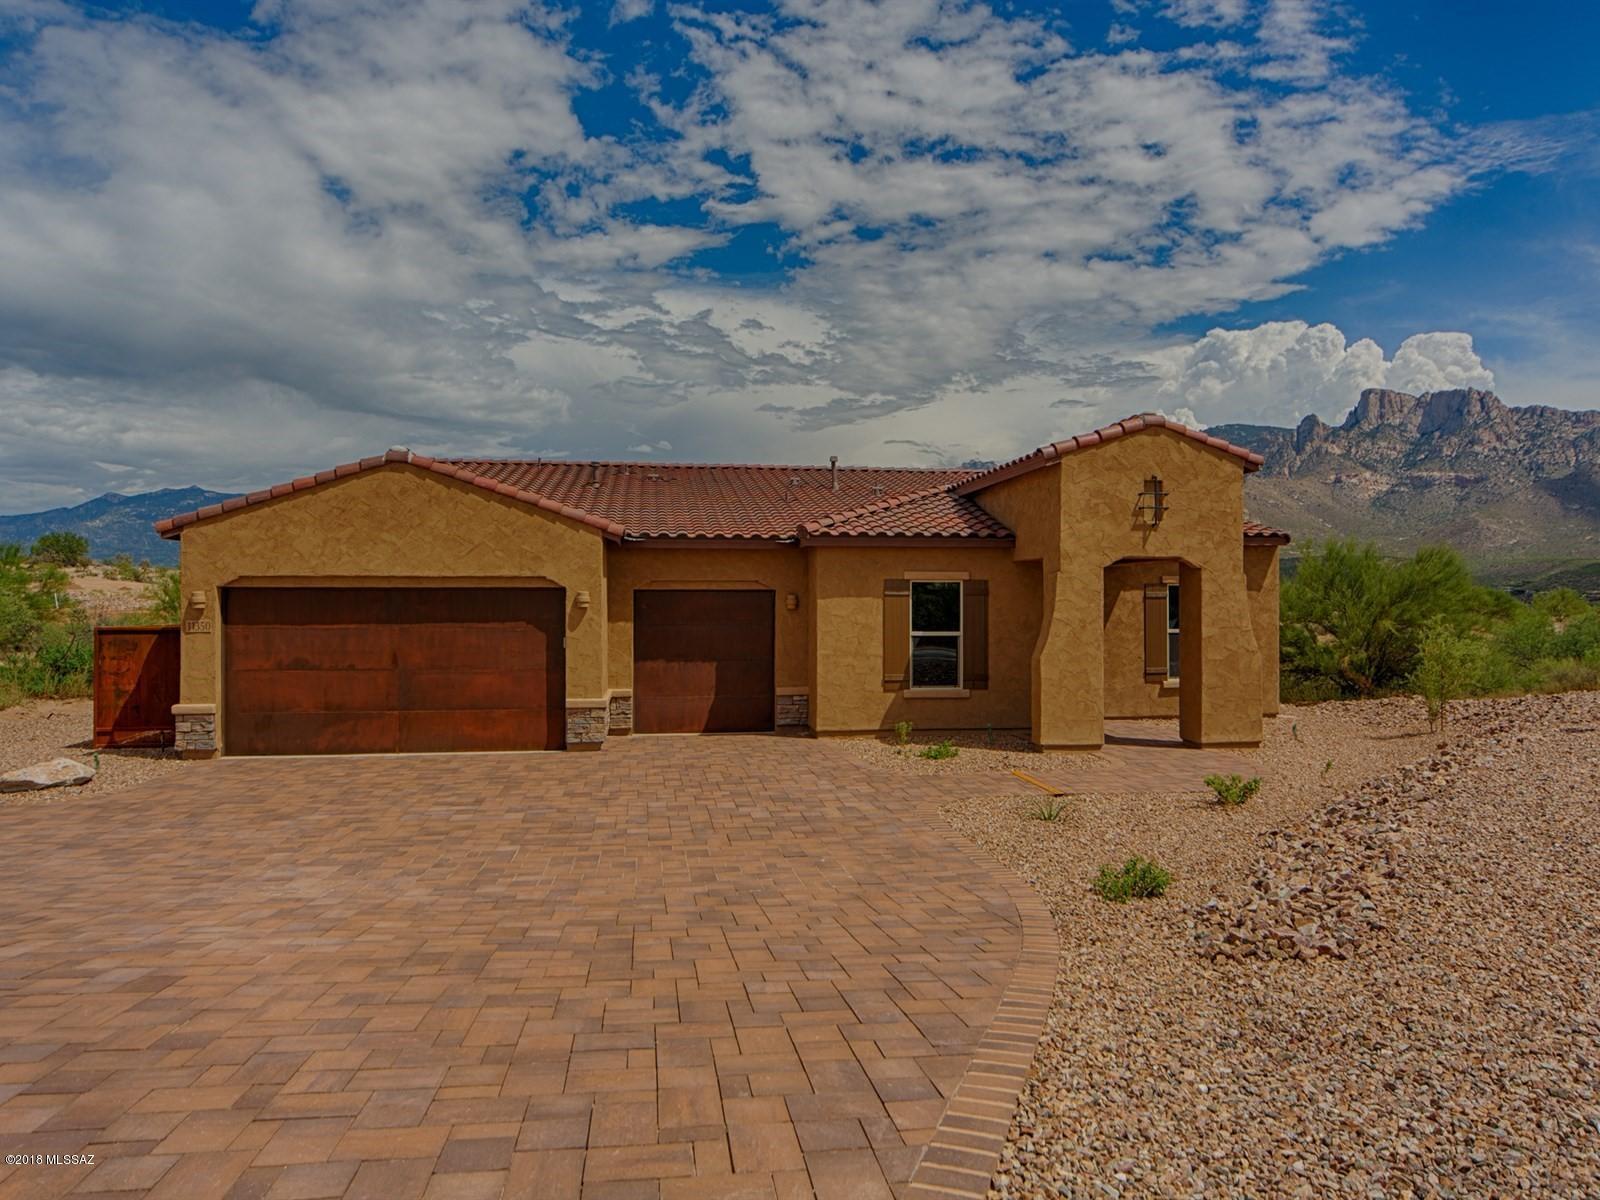 Photo of 11350 N RIDGEWAY VILLAGE Place, Oro Valley, AZ 85737